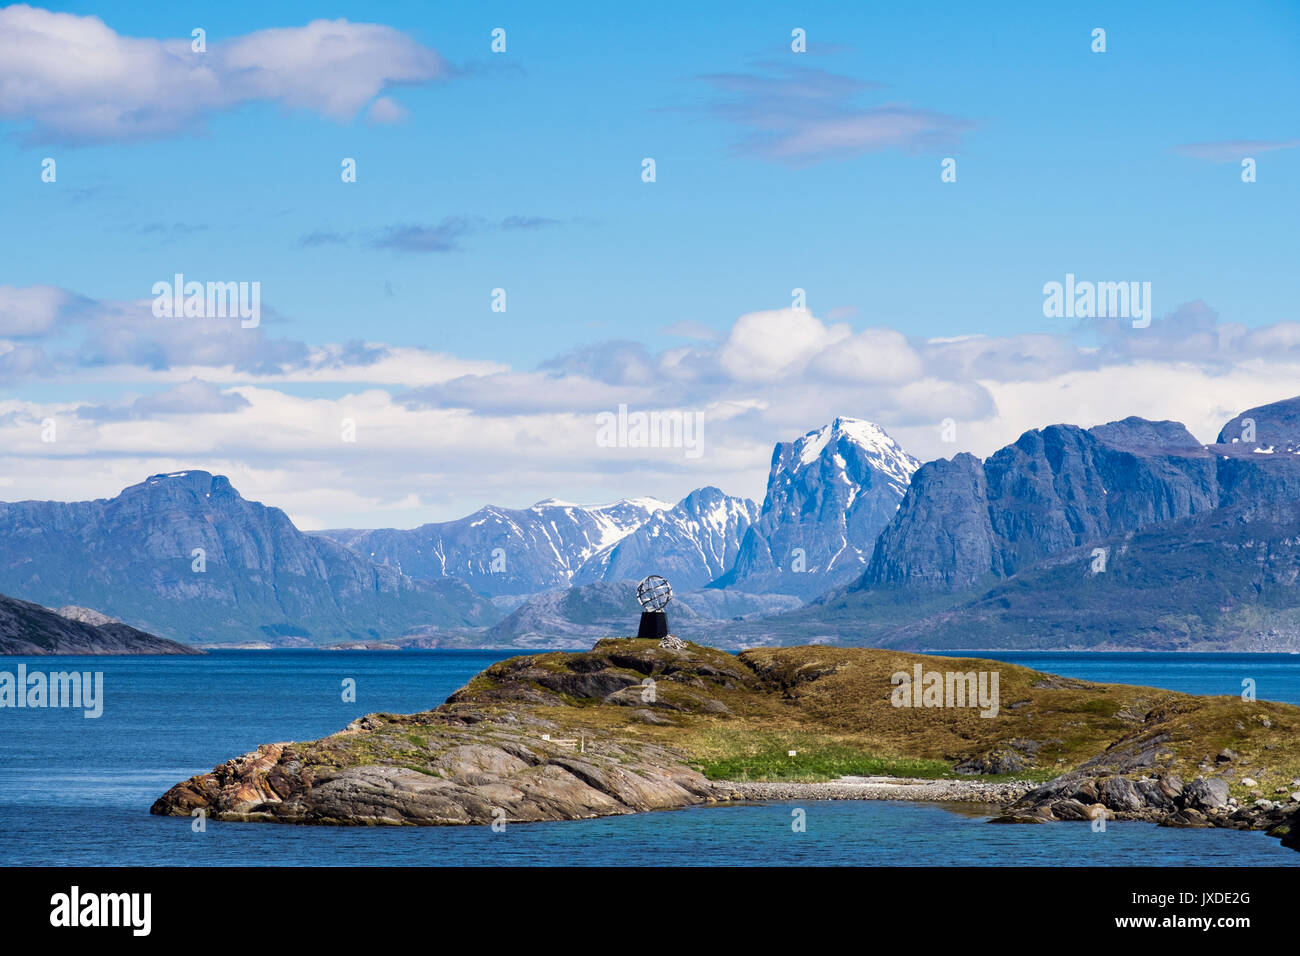 Arctic Circle Monument Globe sculpture on Vikingen Island on west coast. Rødøy municipality, Nordland, Norway, Scandinavia - Stock Image